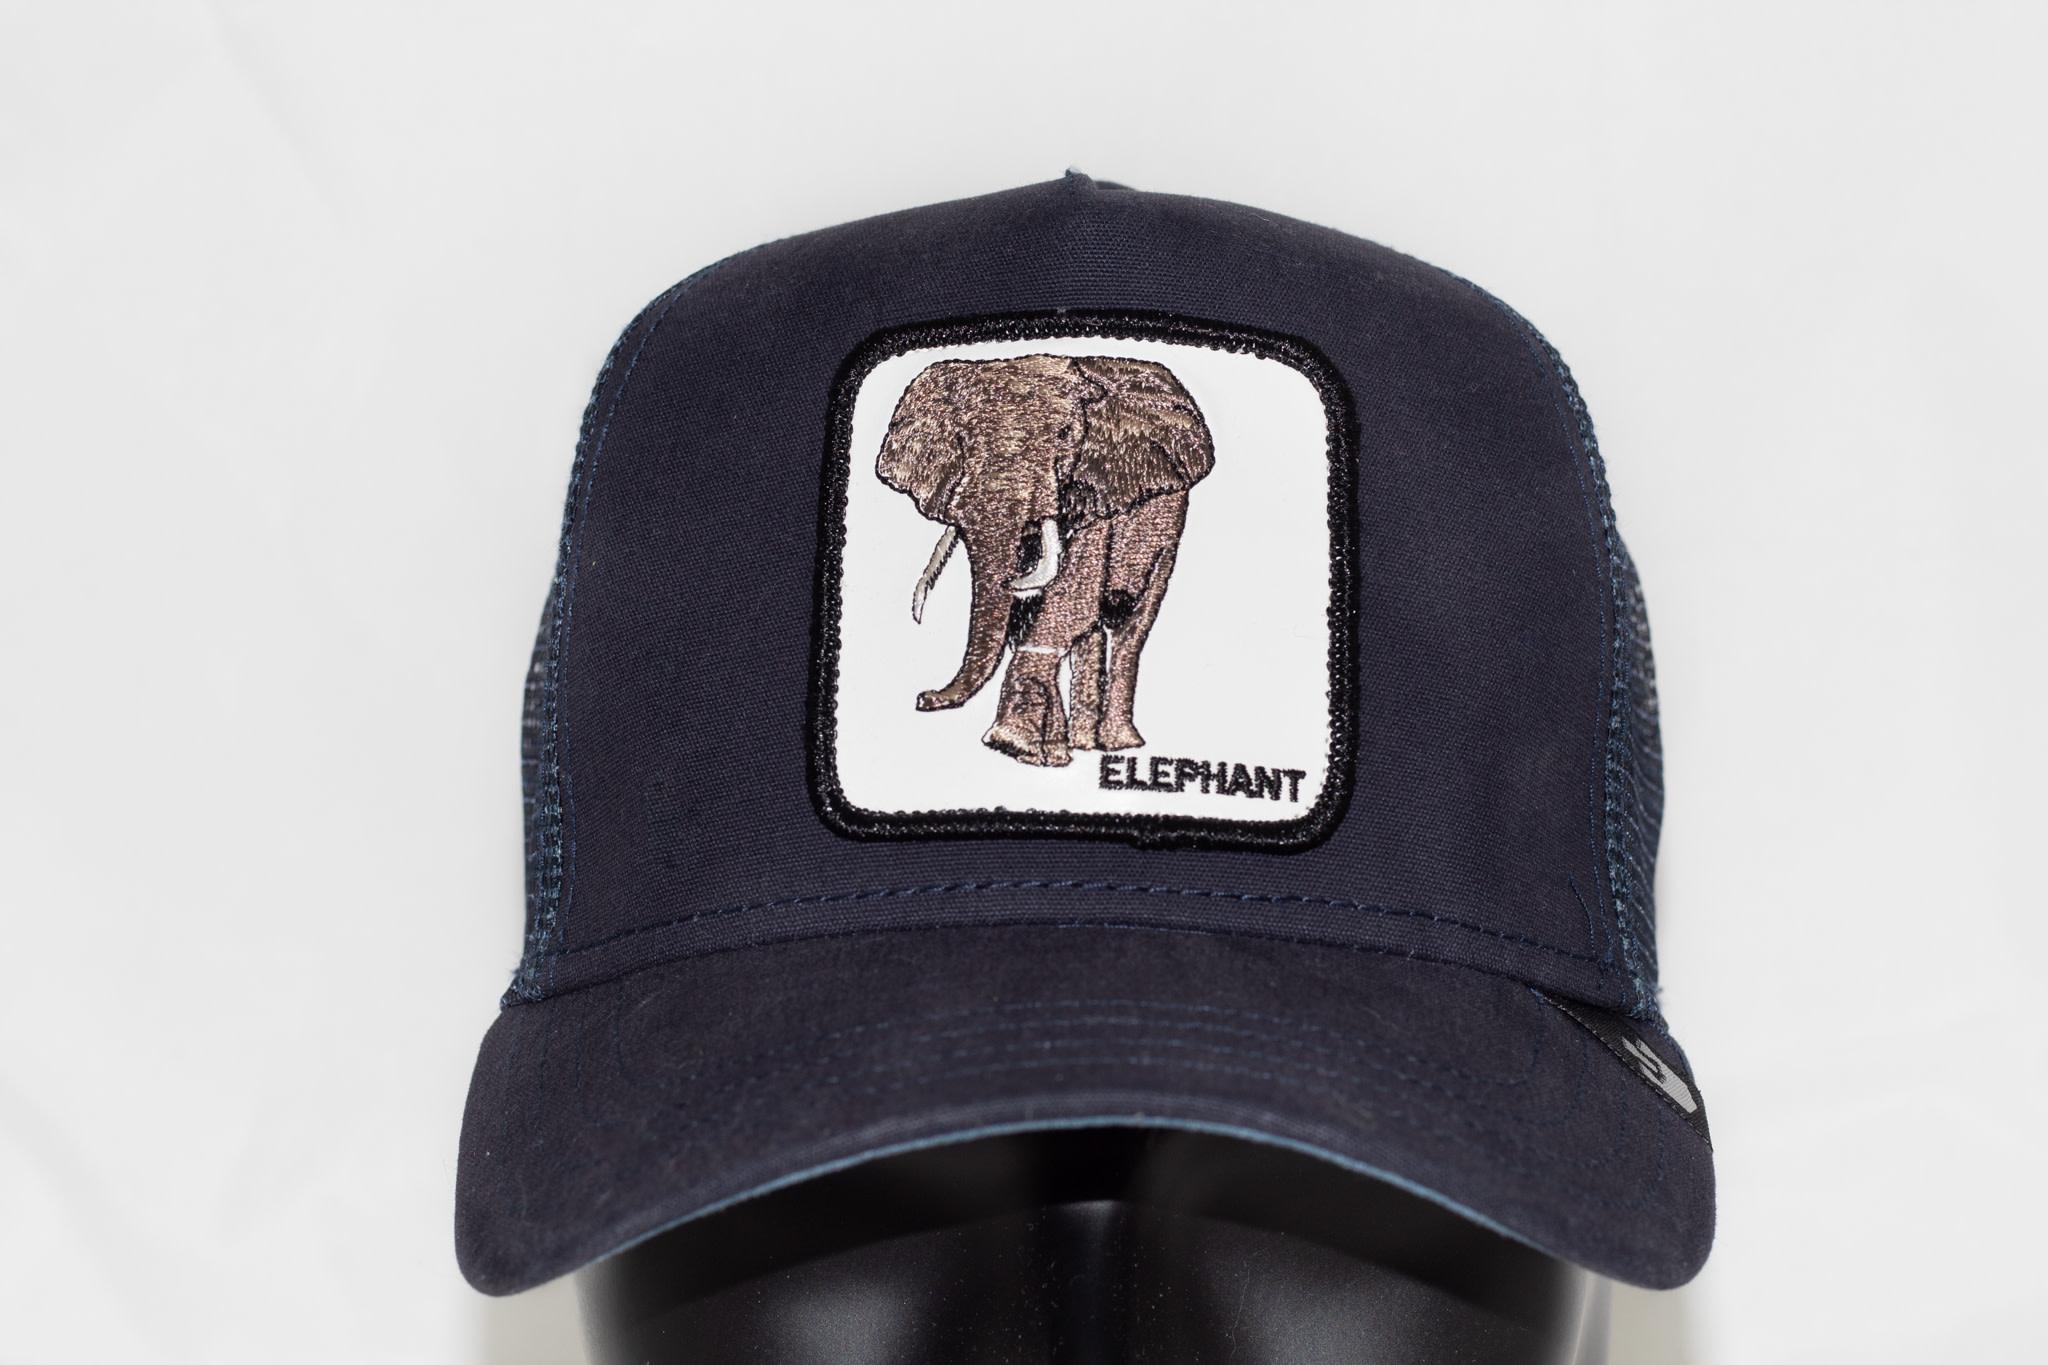 GOORIN BROS ELEPHANT Navy